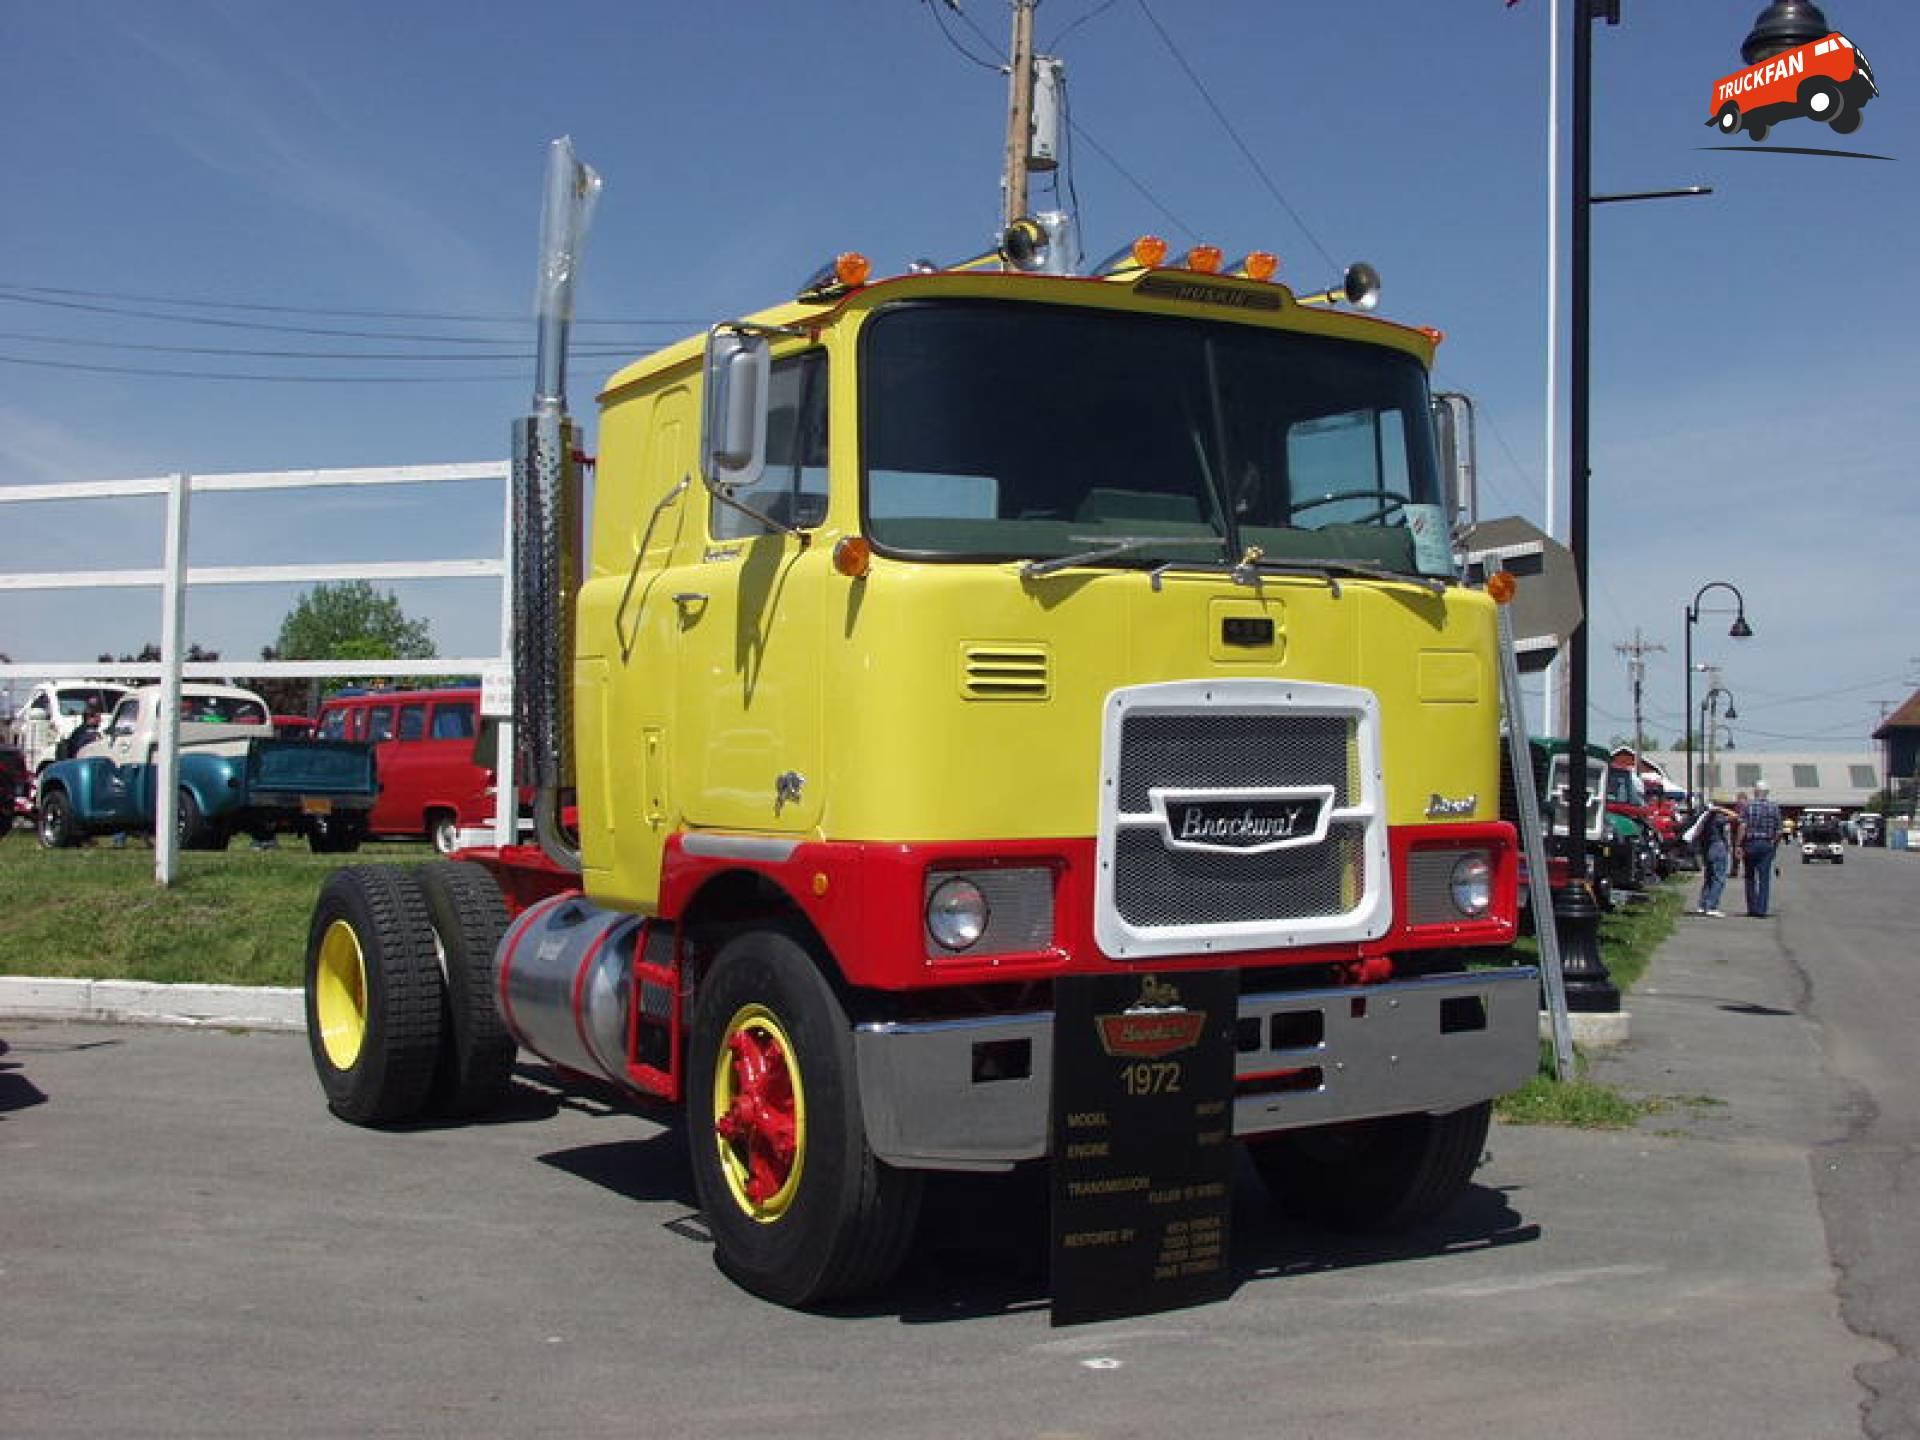 Brockway K459 T